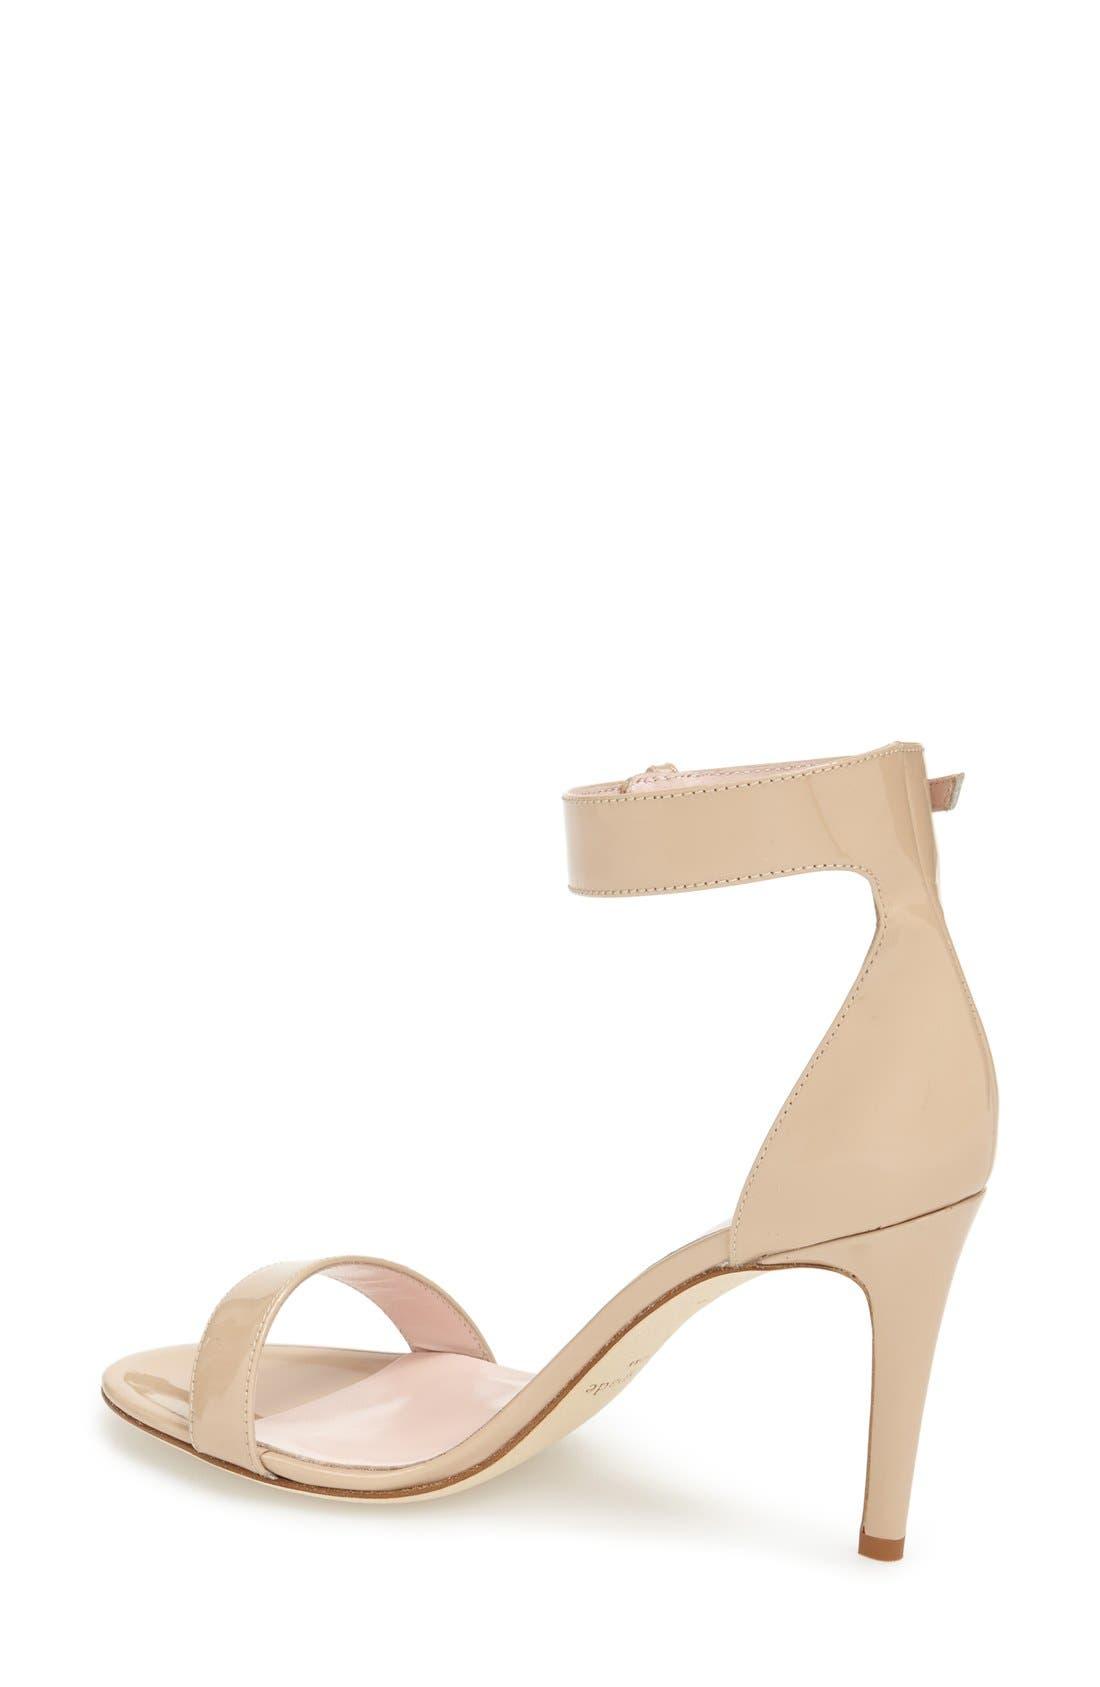 Alternate Image 2  - kate spade new york 'isa' ankle strap sandal (Women)